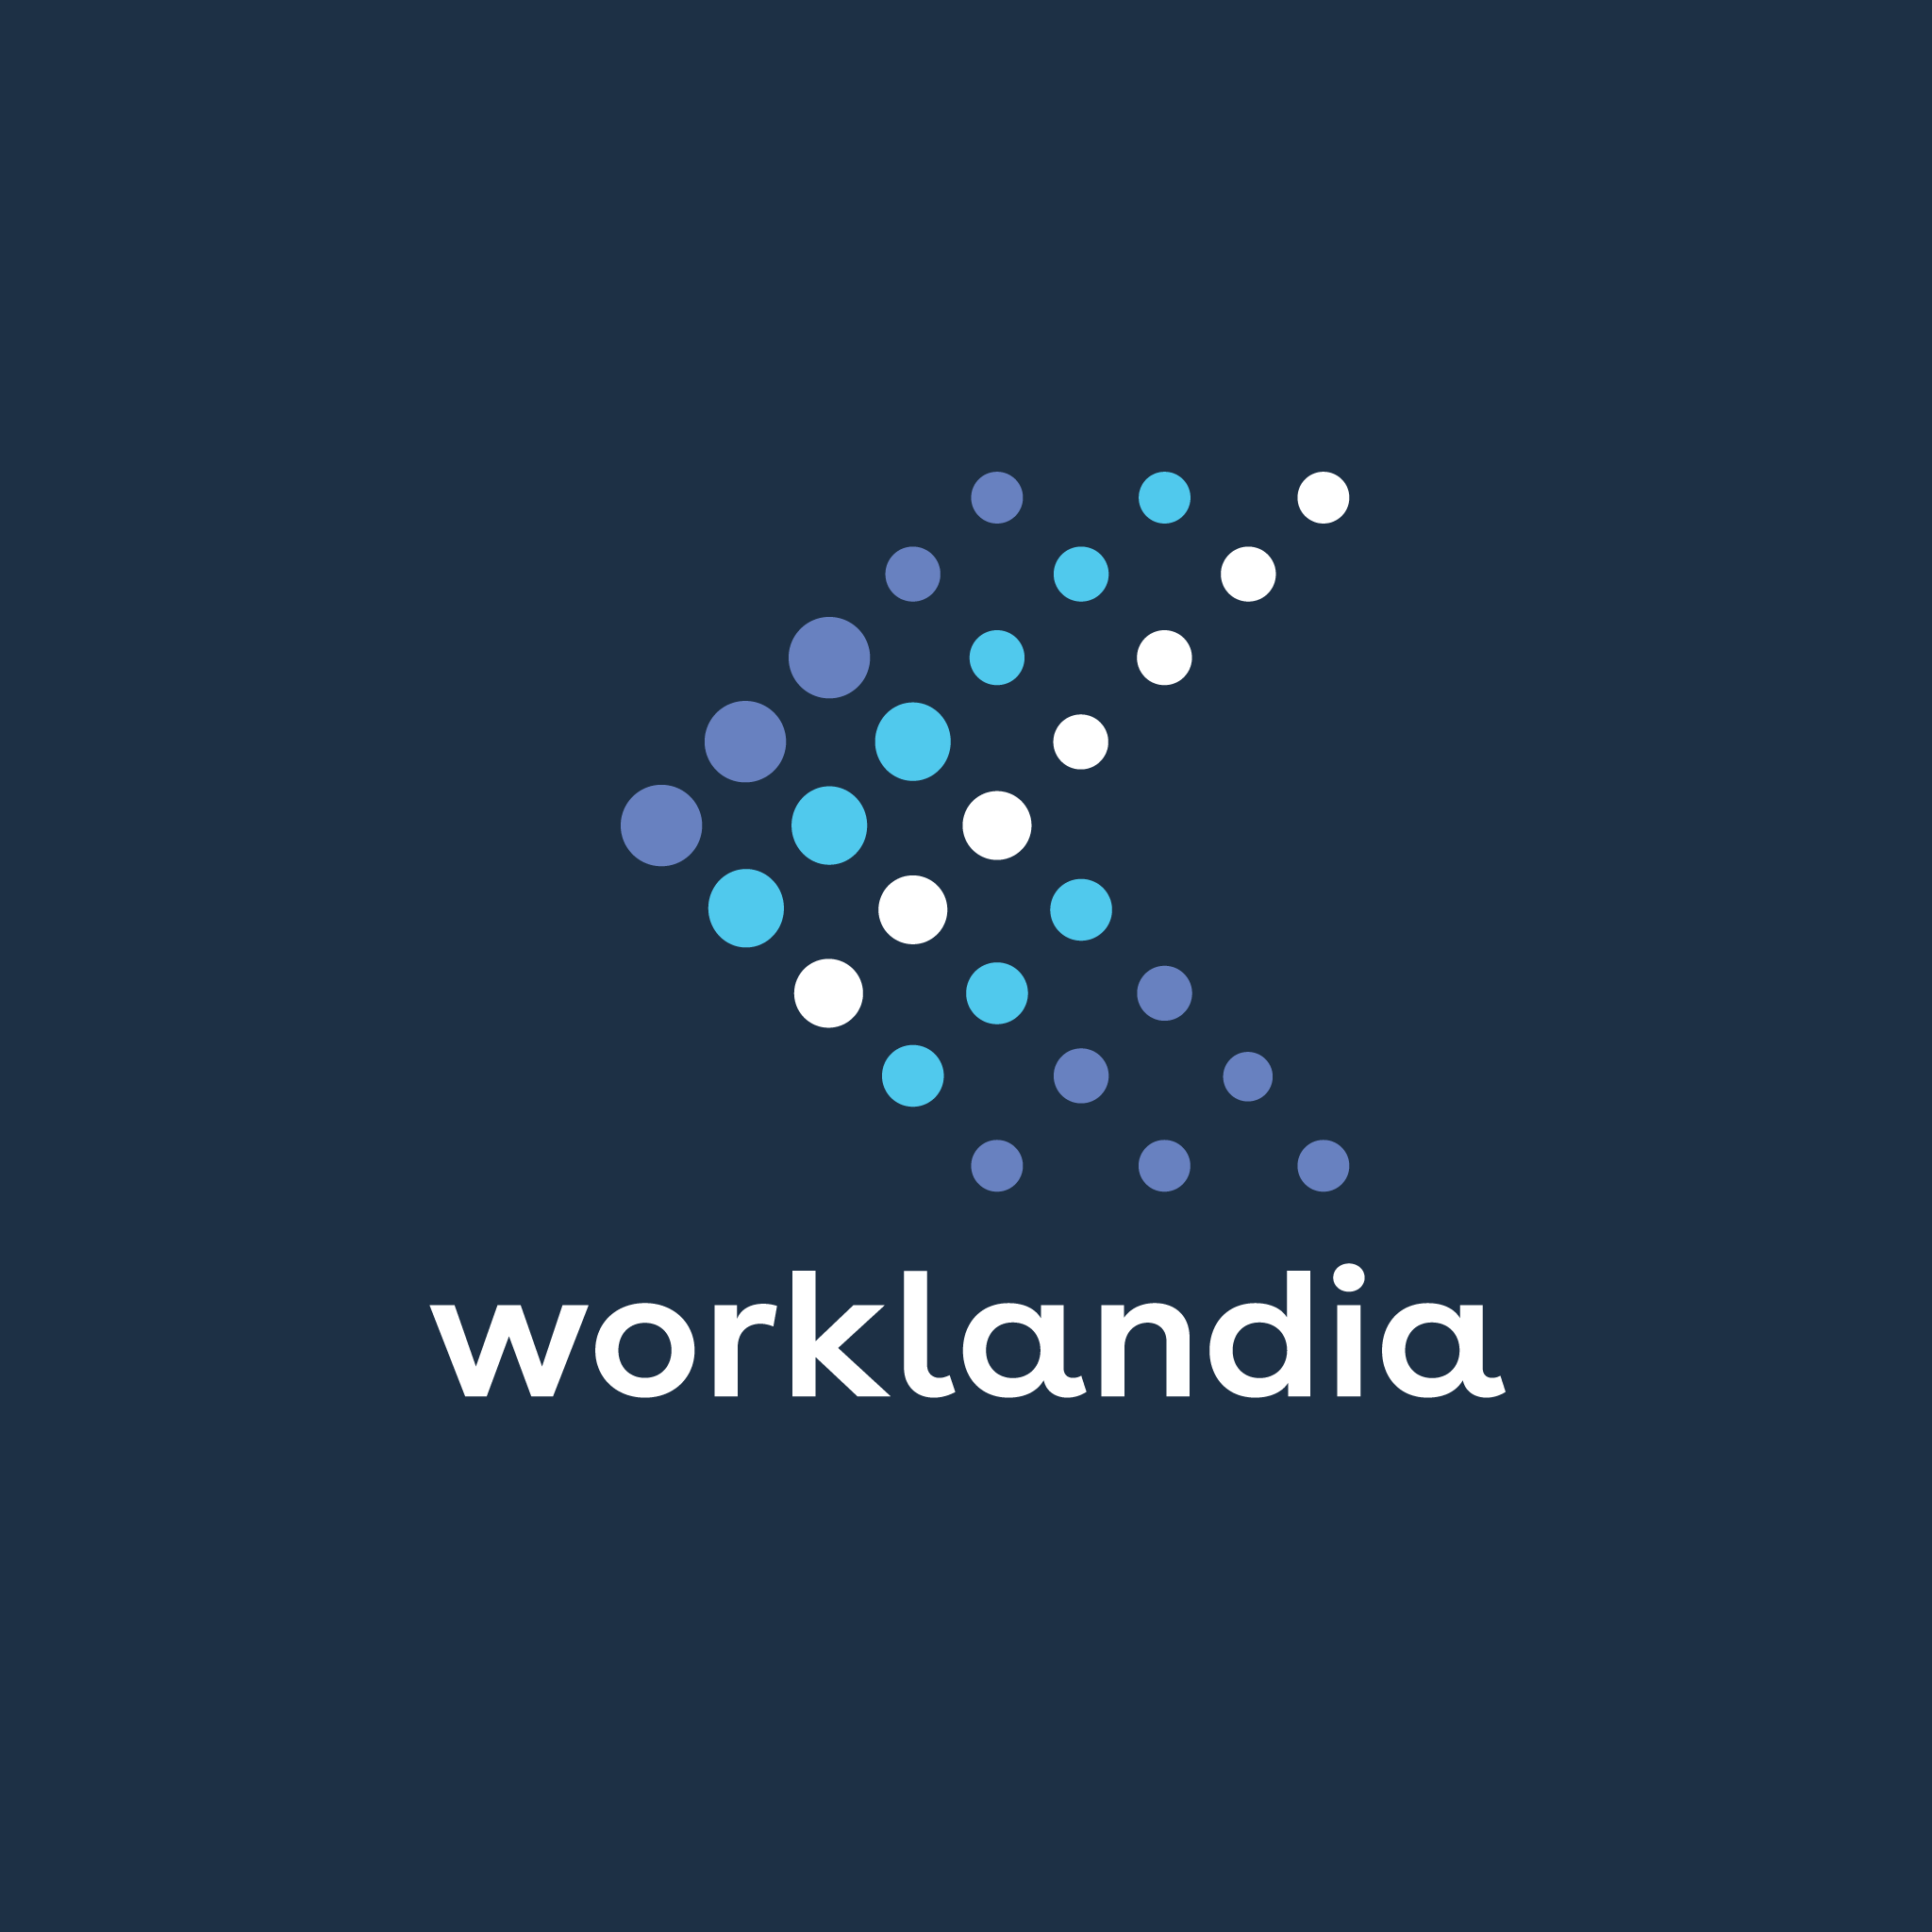 Worklandia